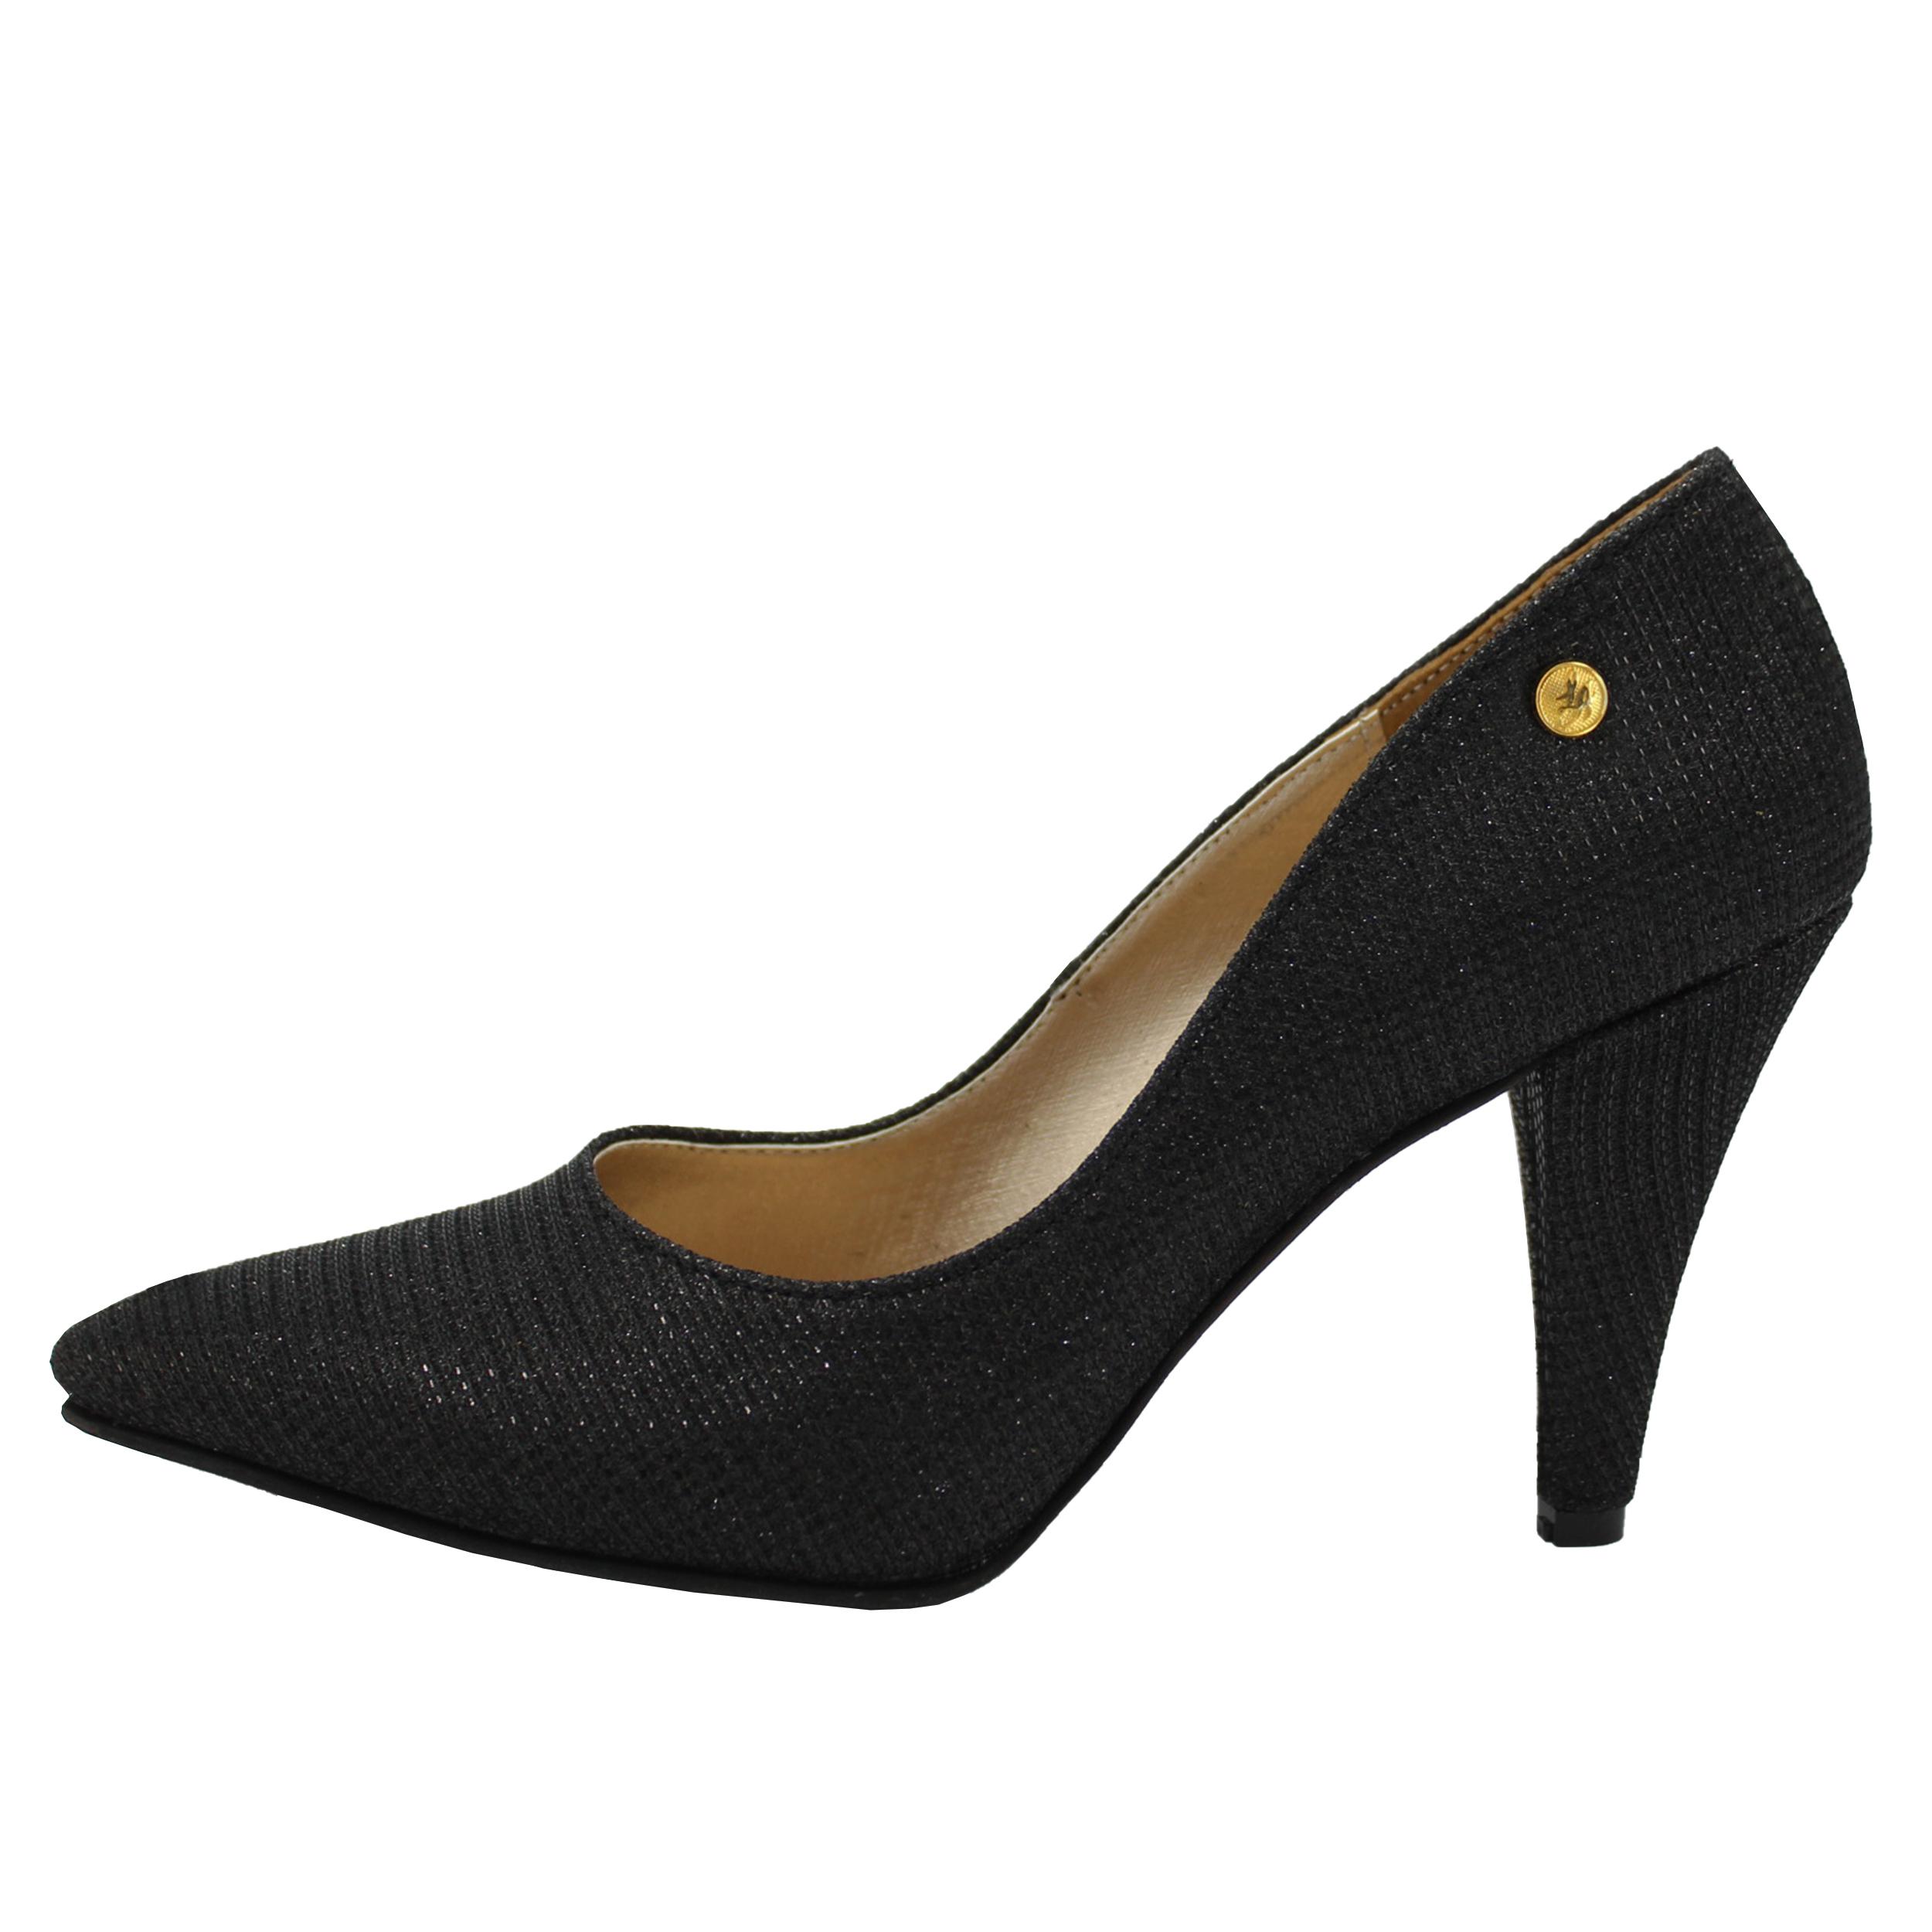 کفش زنانه لیانا کد 7002-M